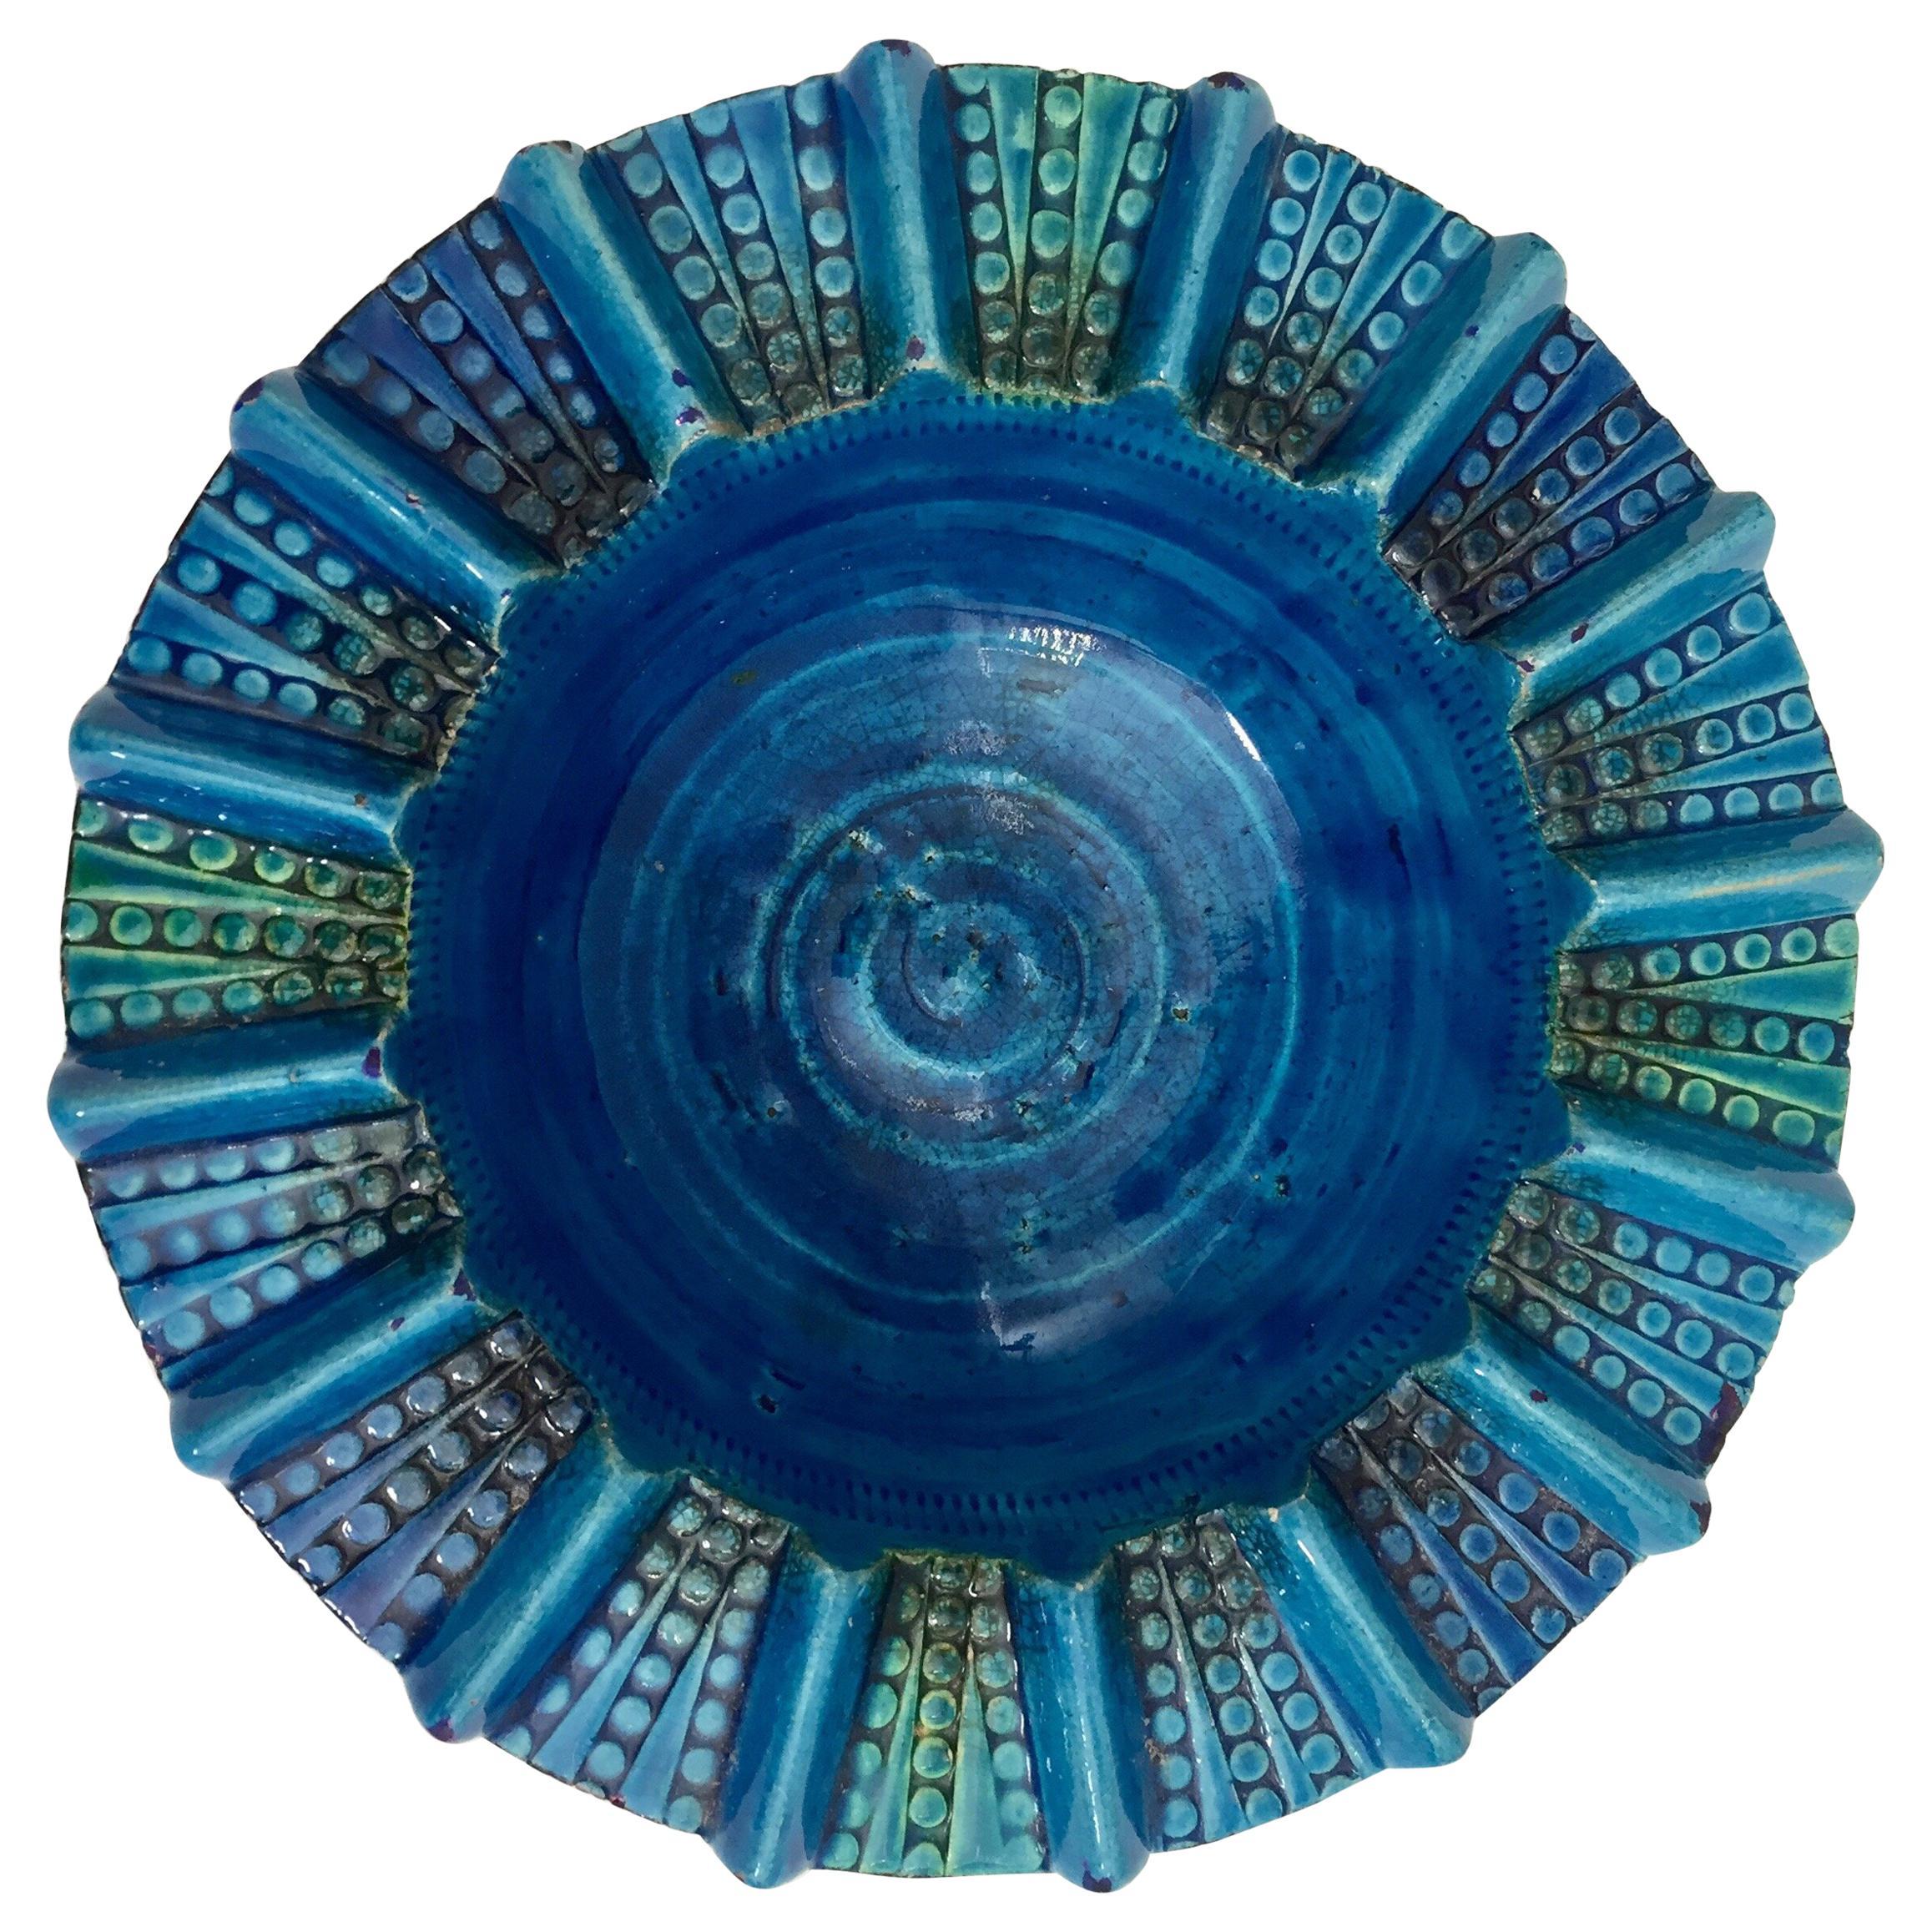 Aldo Londi Blue Ceramic Ashtray Handcrafted in Italy